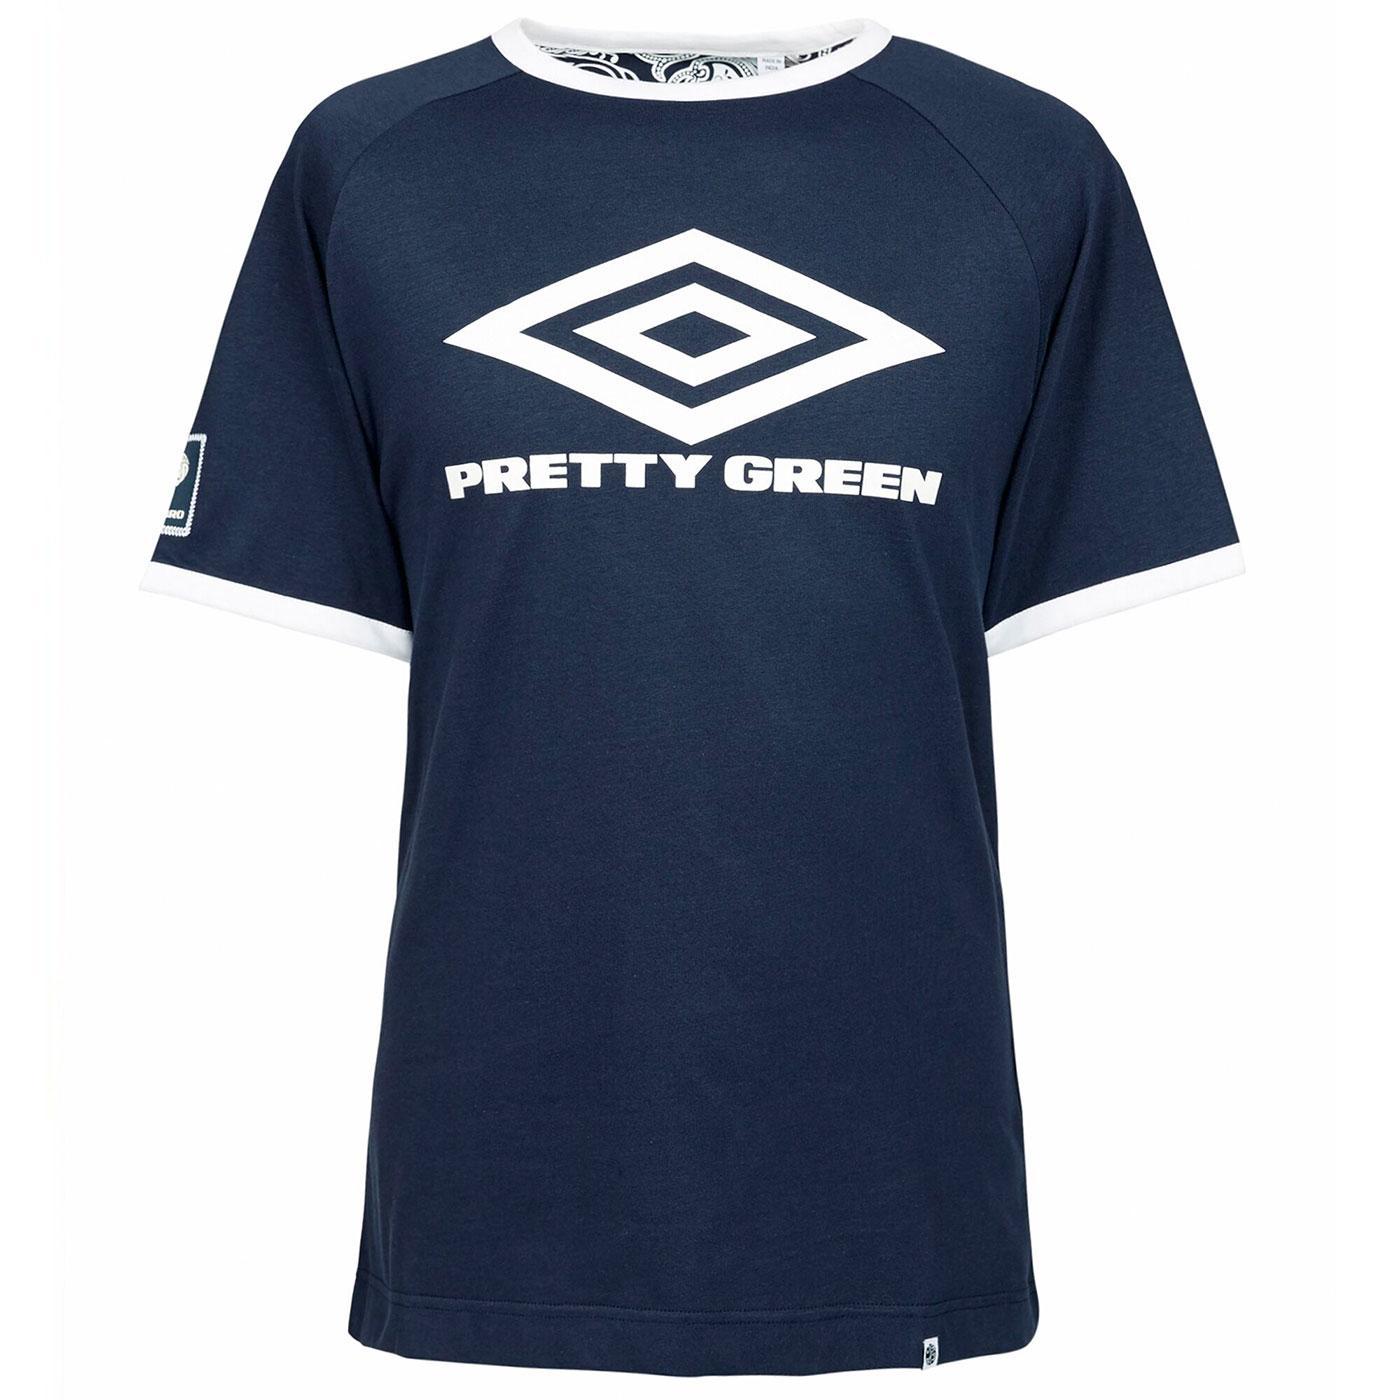 PRETTY GREEN X UMBRO Retro Indie Ringer Logo Tee